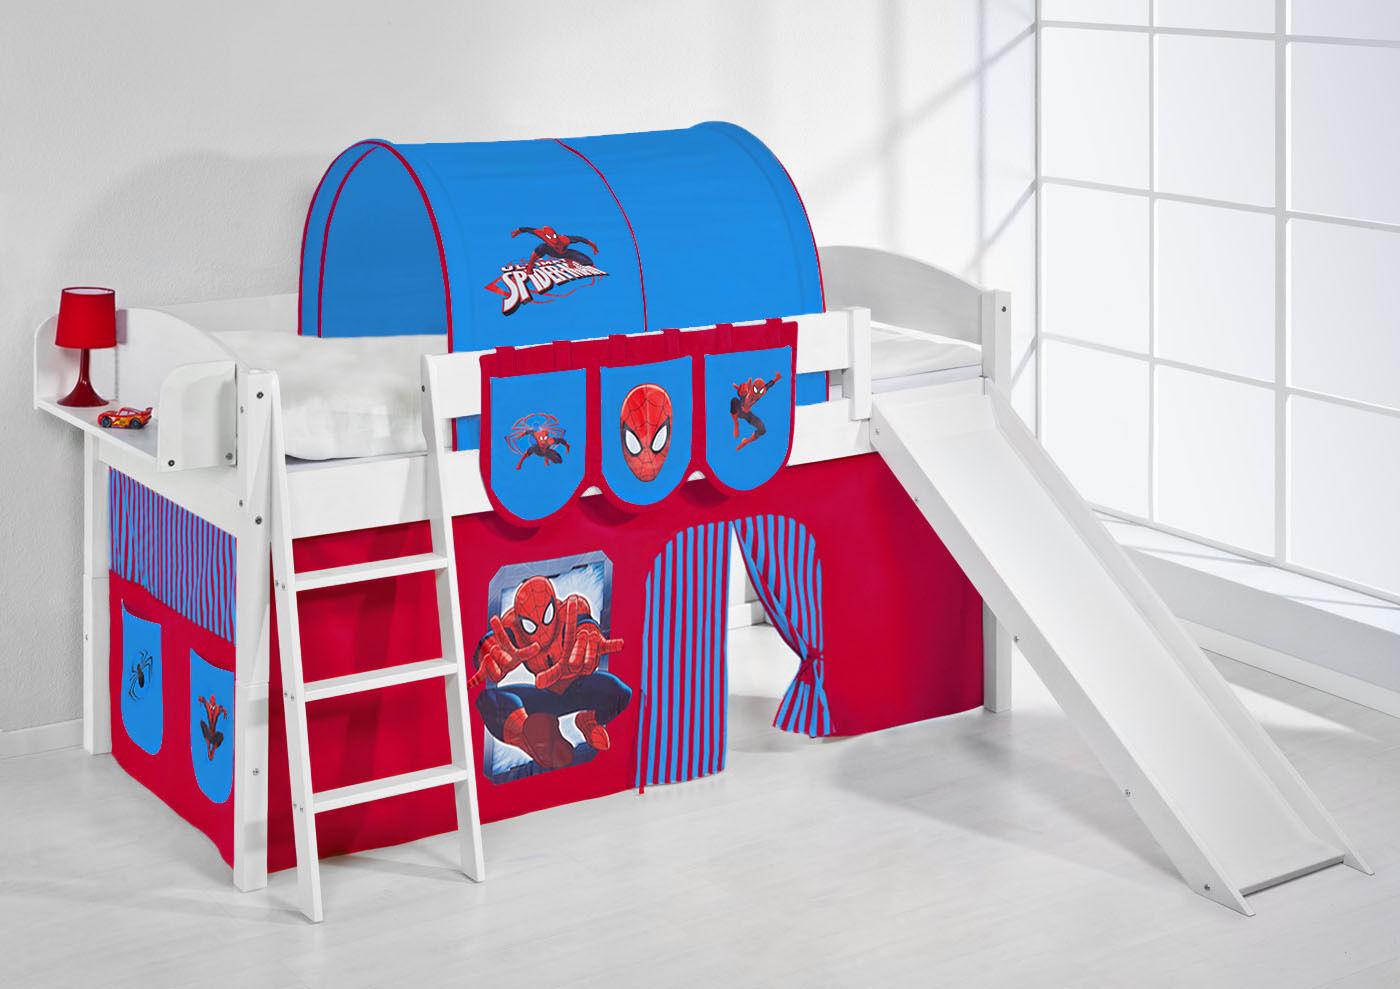 Spielbett surelevé superposé avec toboggan NEUF 4105 LILOKIDS spiderman